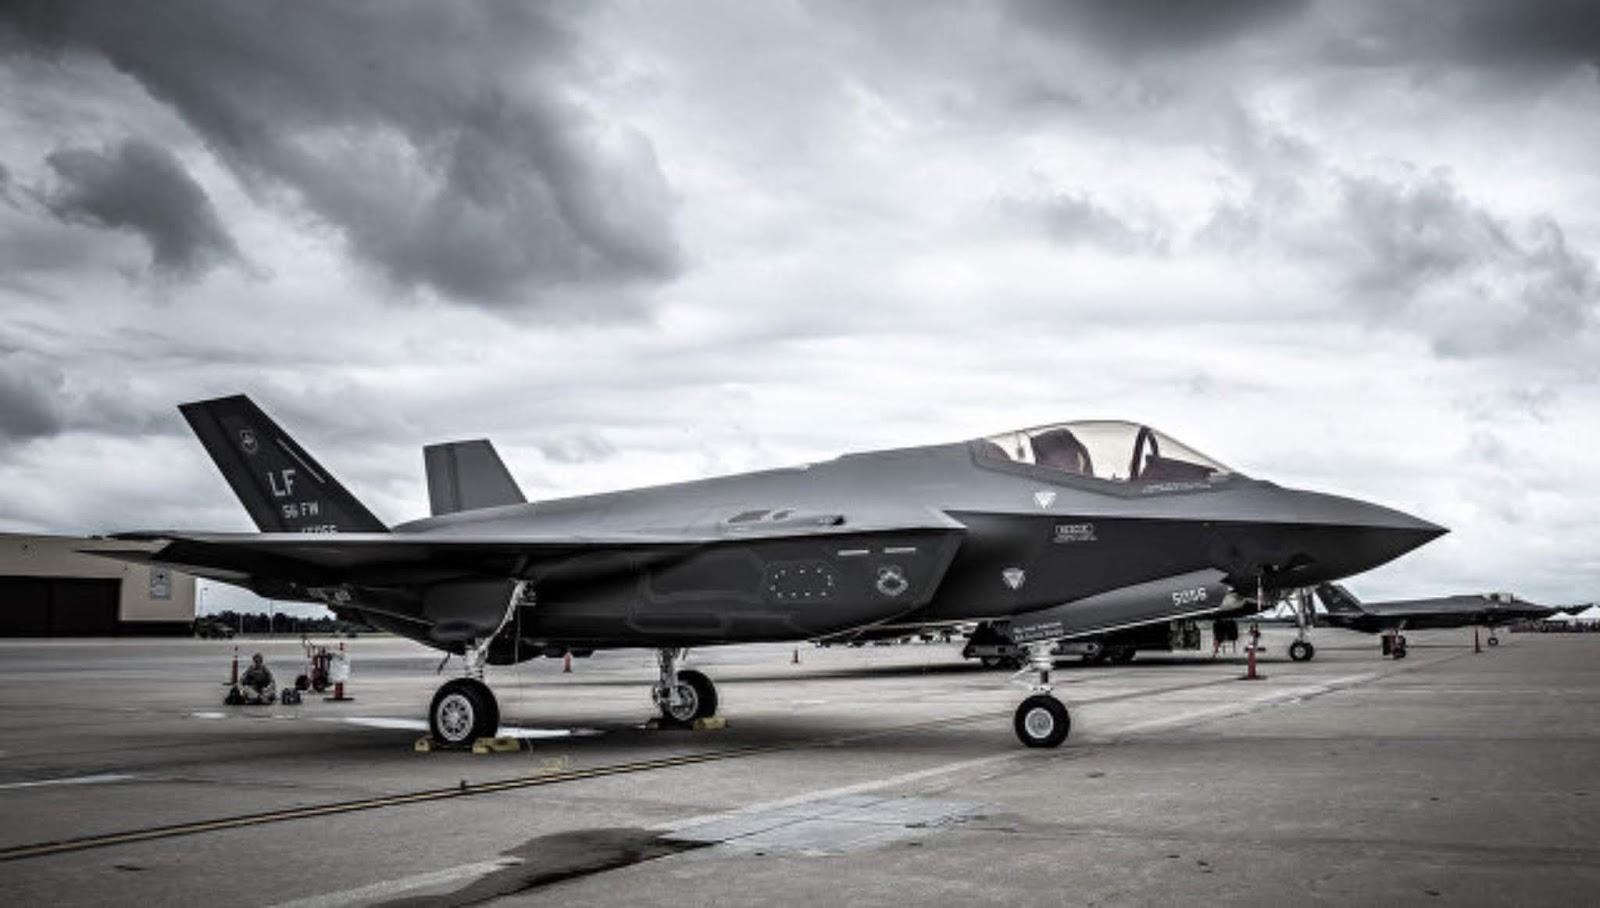 Turki mengumumkan tidak adanya penundaan dalam pasokan jet tempur F-35